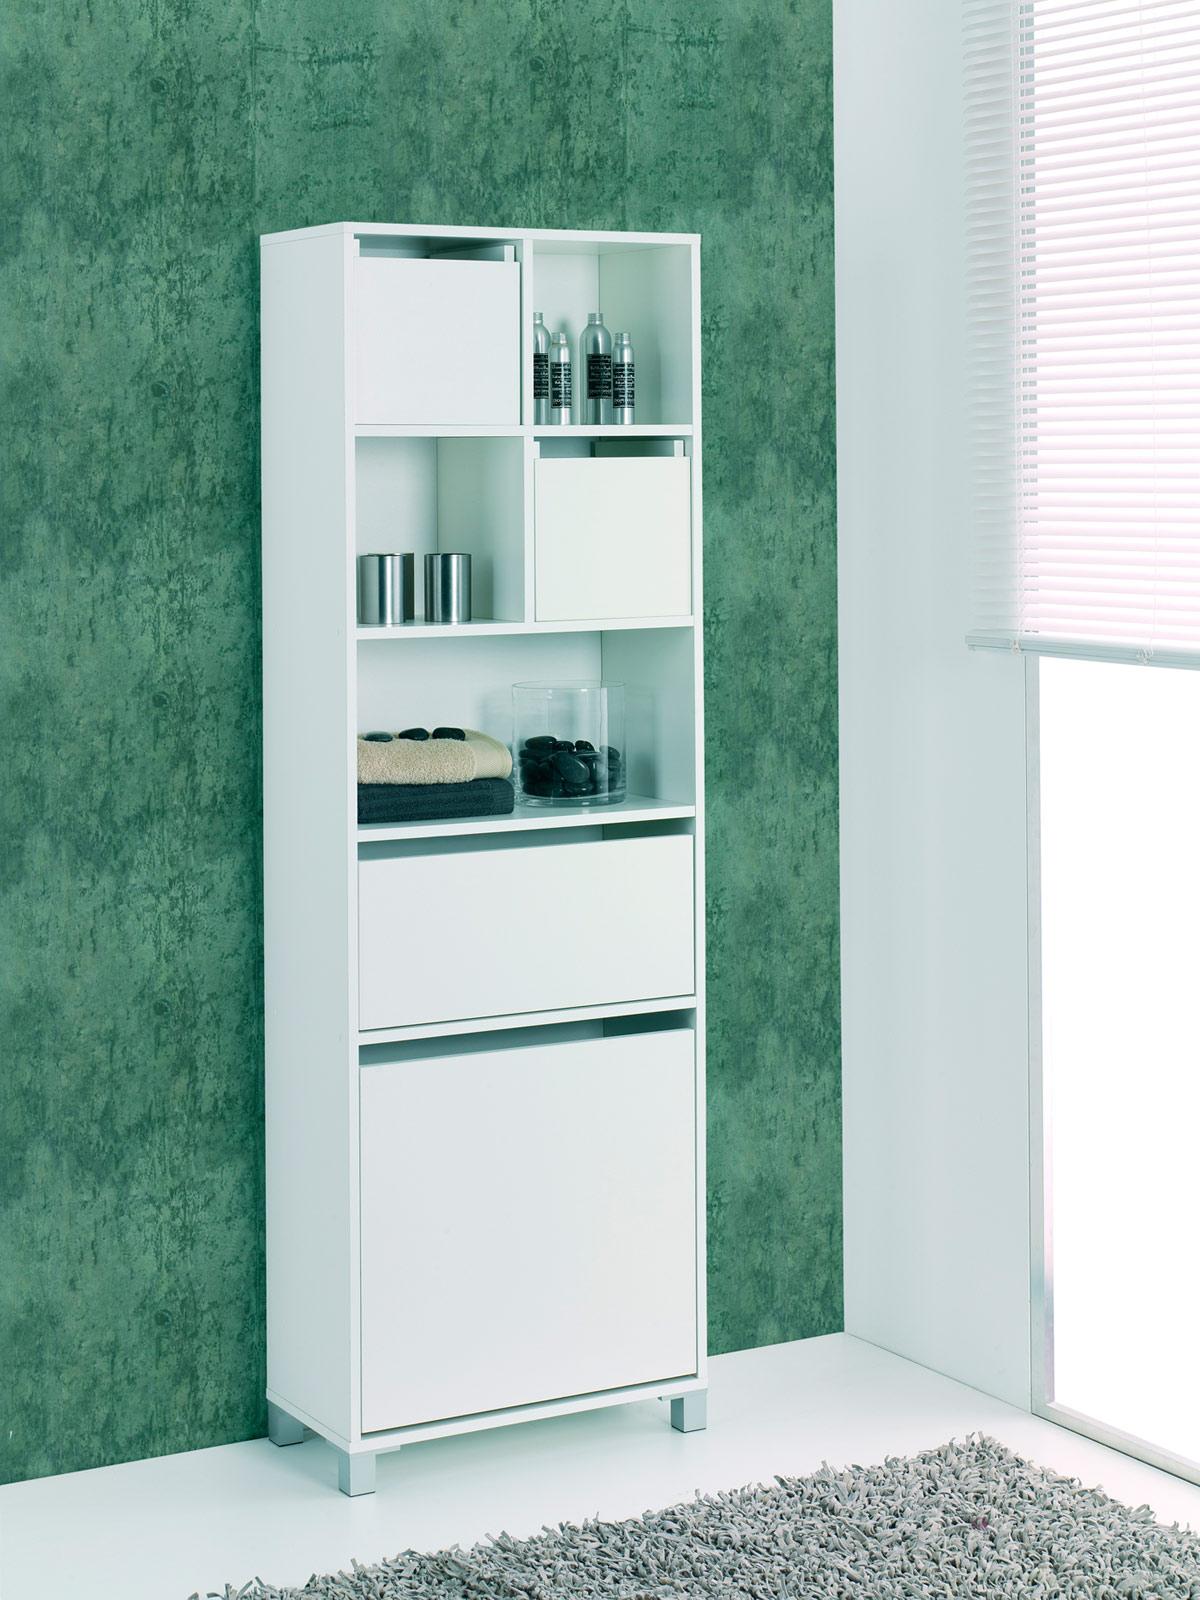 Columna mueble ba o en blanco barato oferta compradeluxe - Ofertas muebles de bano ...